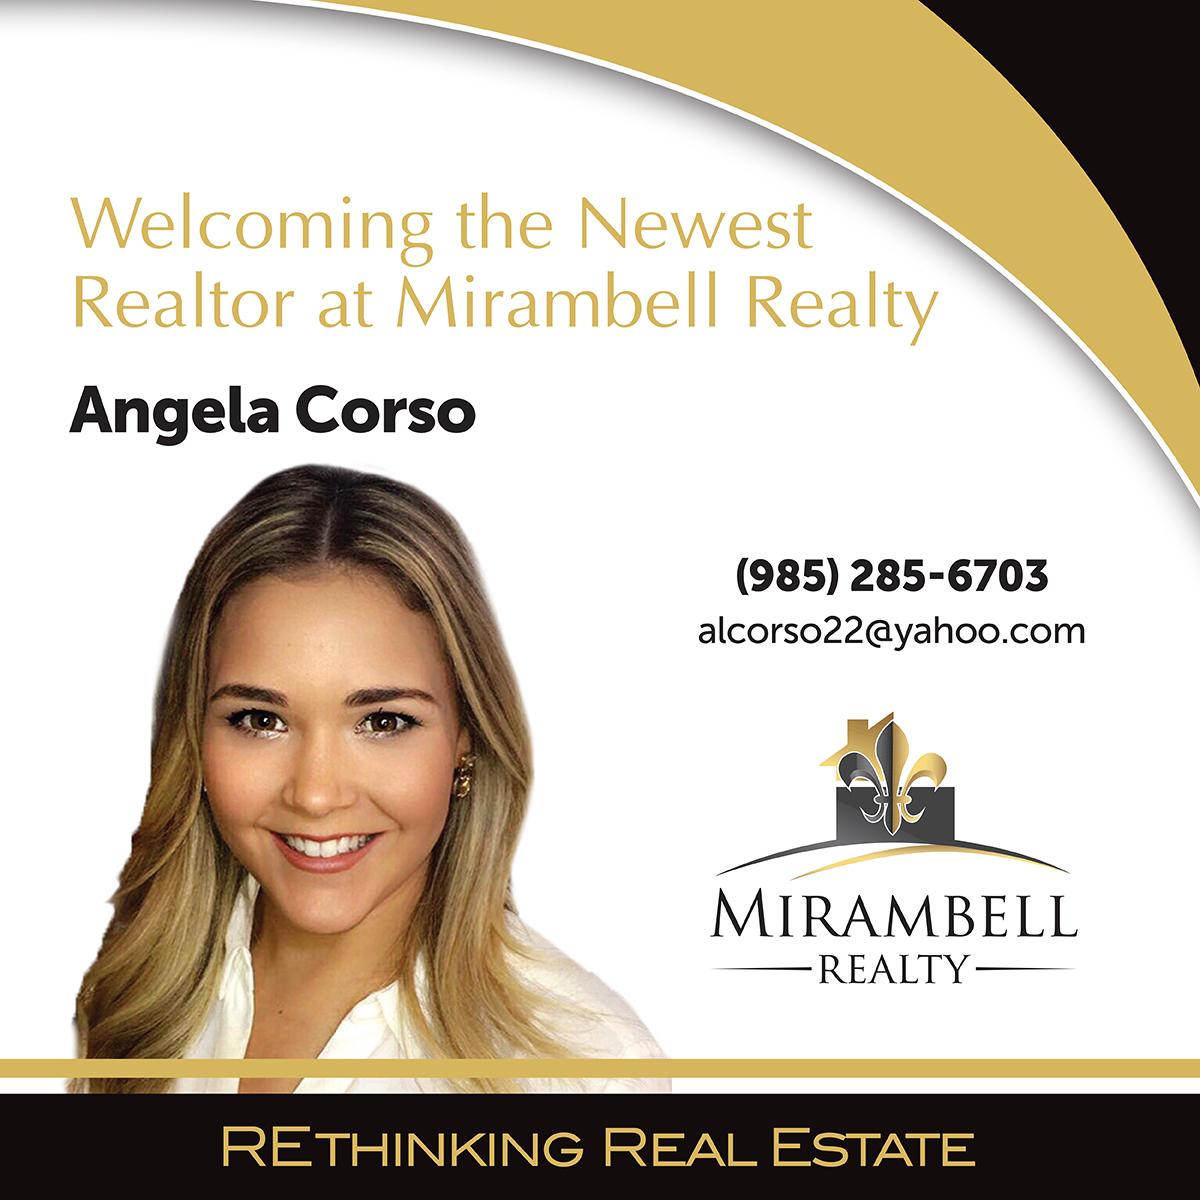 Angela Corso Mirambell Realty